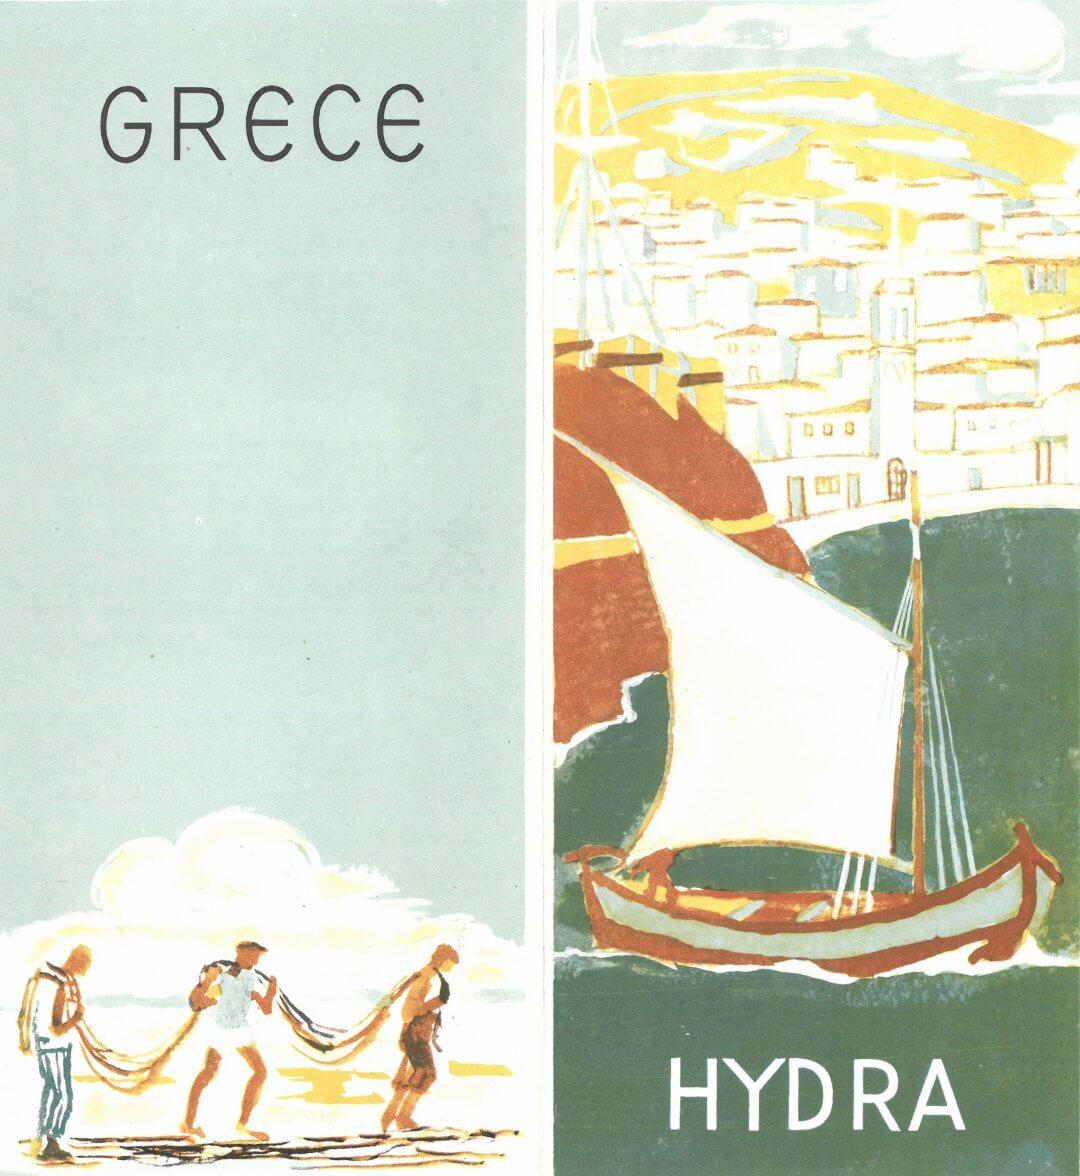 Hydra Greece